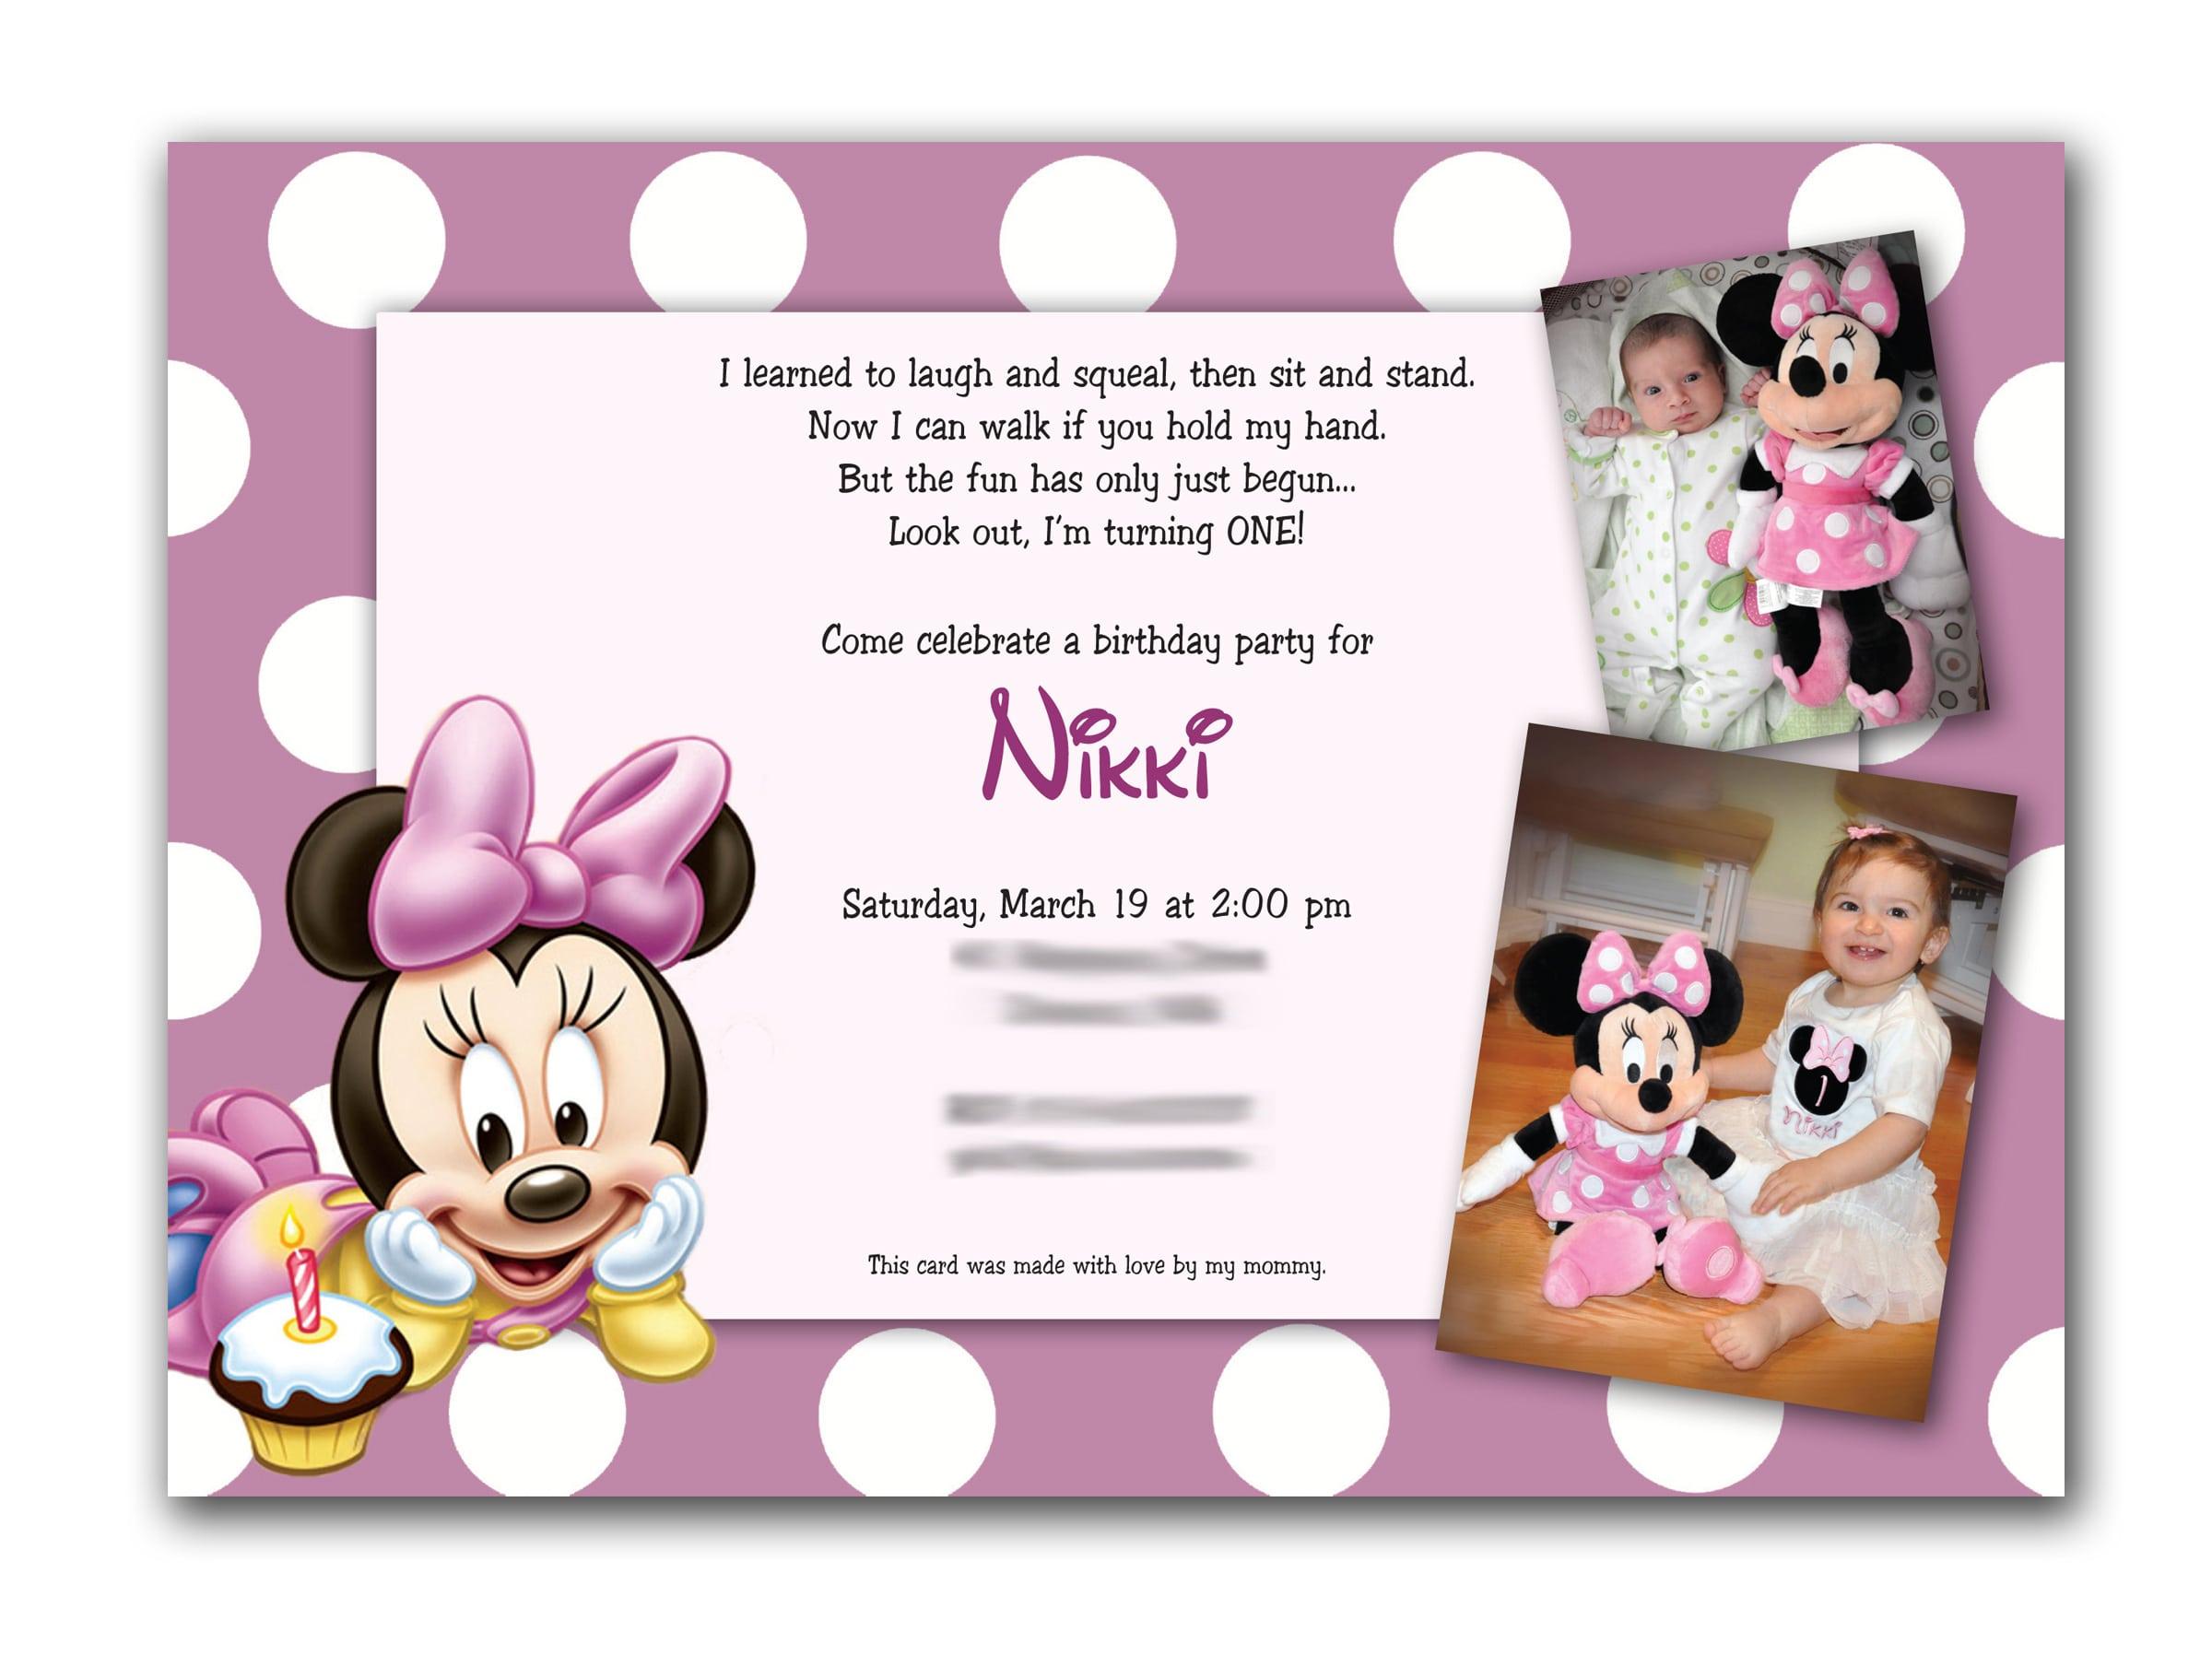 Birthday Invitation Postcards - Birthday invitation card maker in marathi